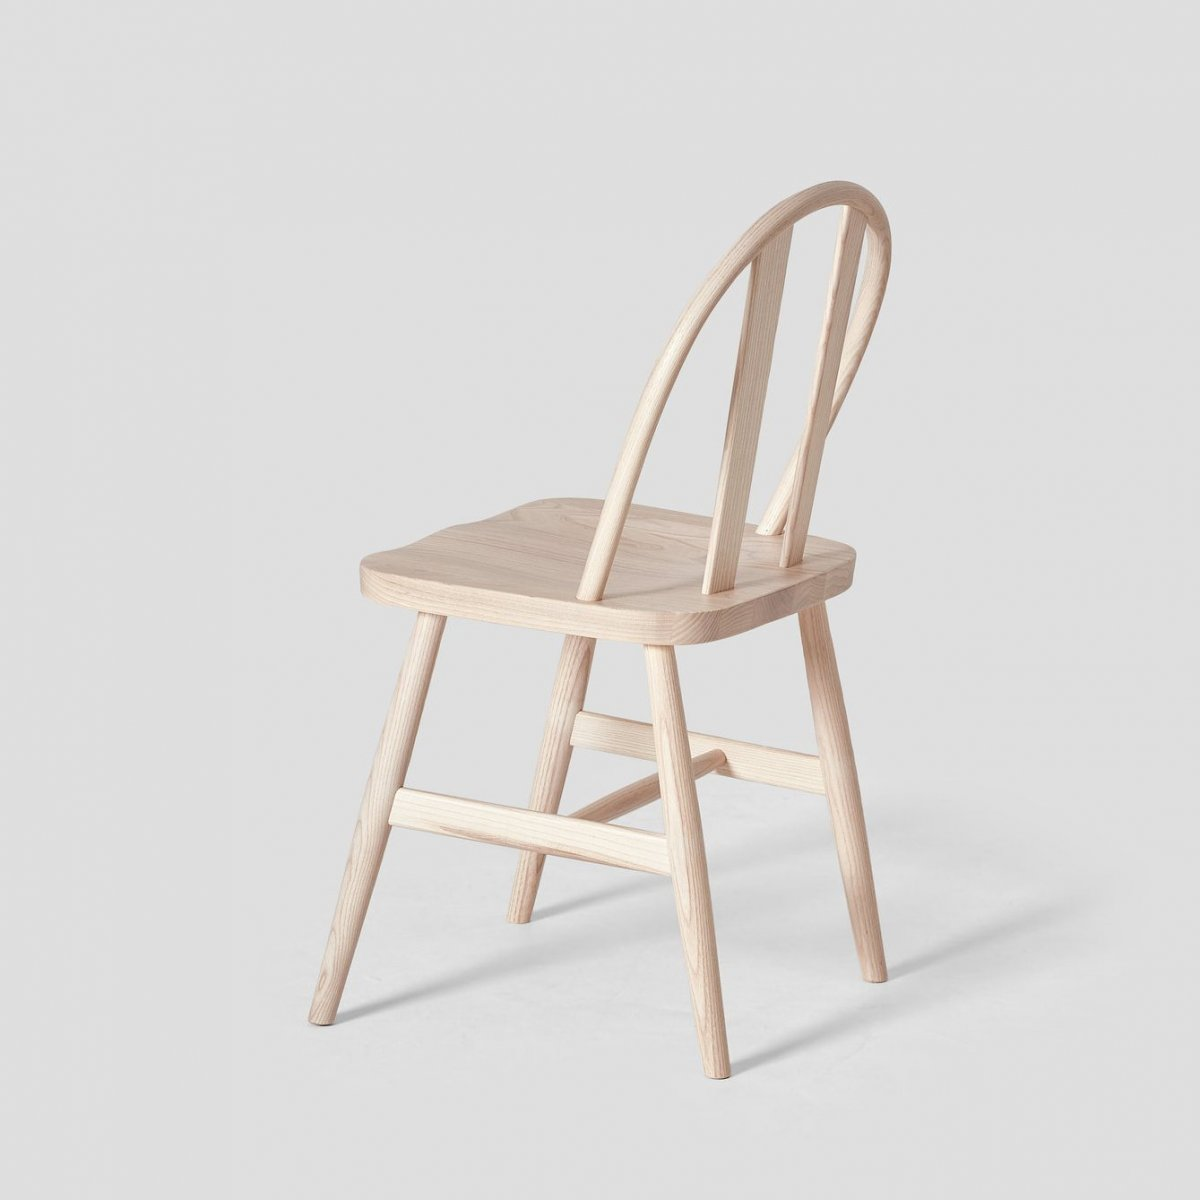 Bird Chair by Very Good  Proper  UP interiors